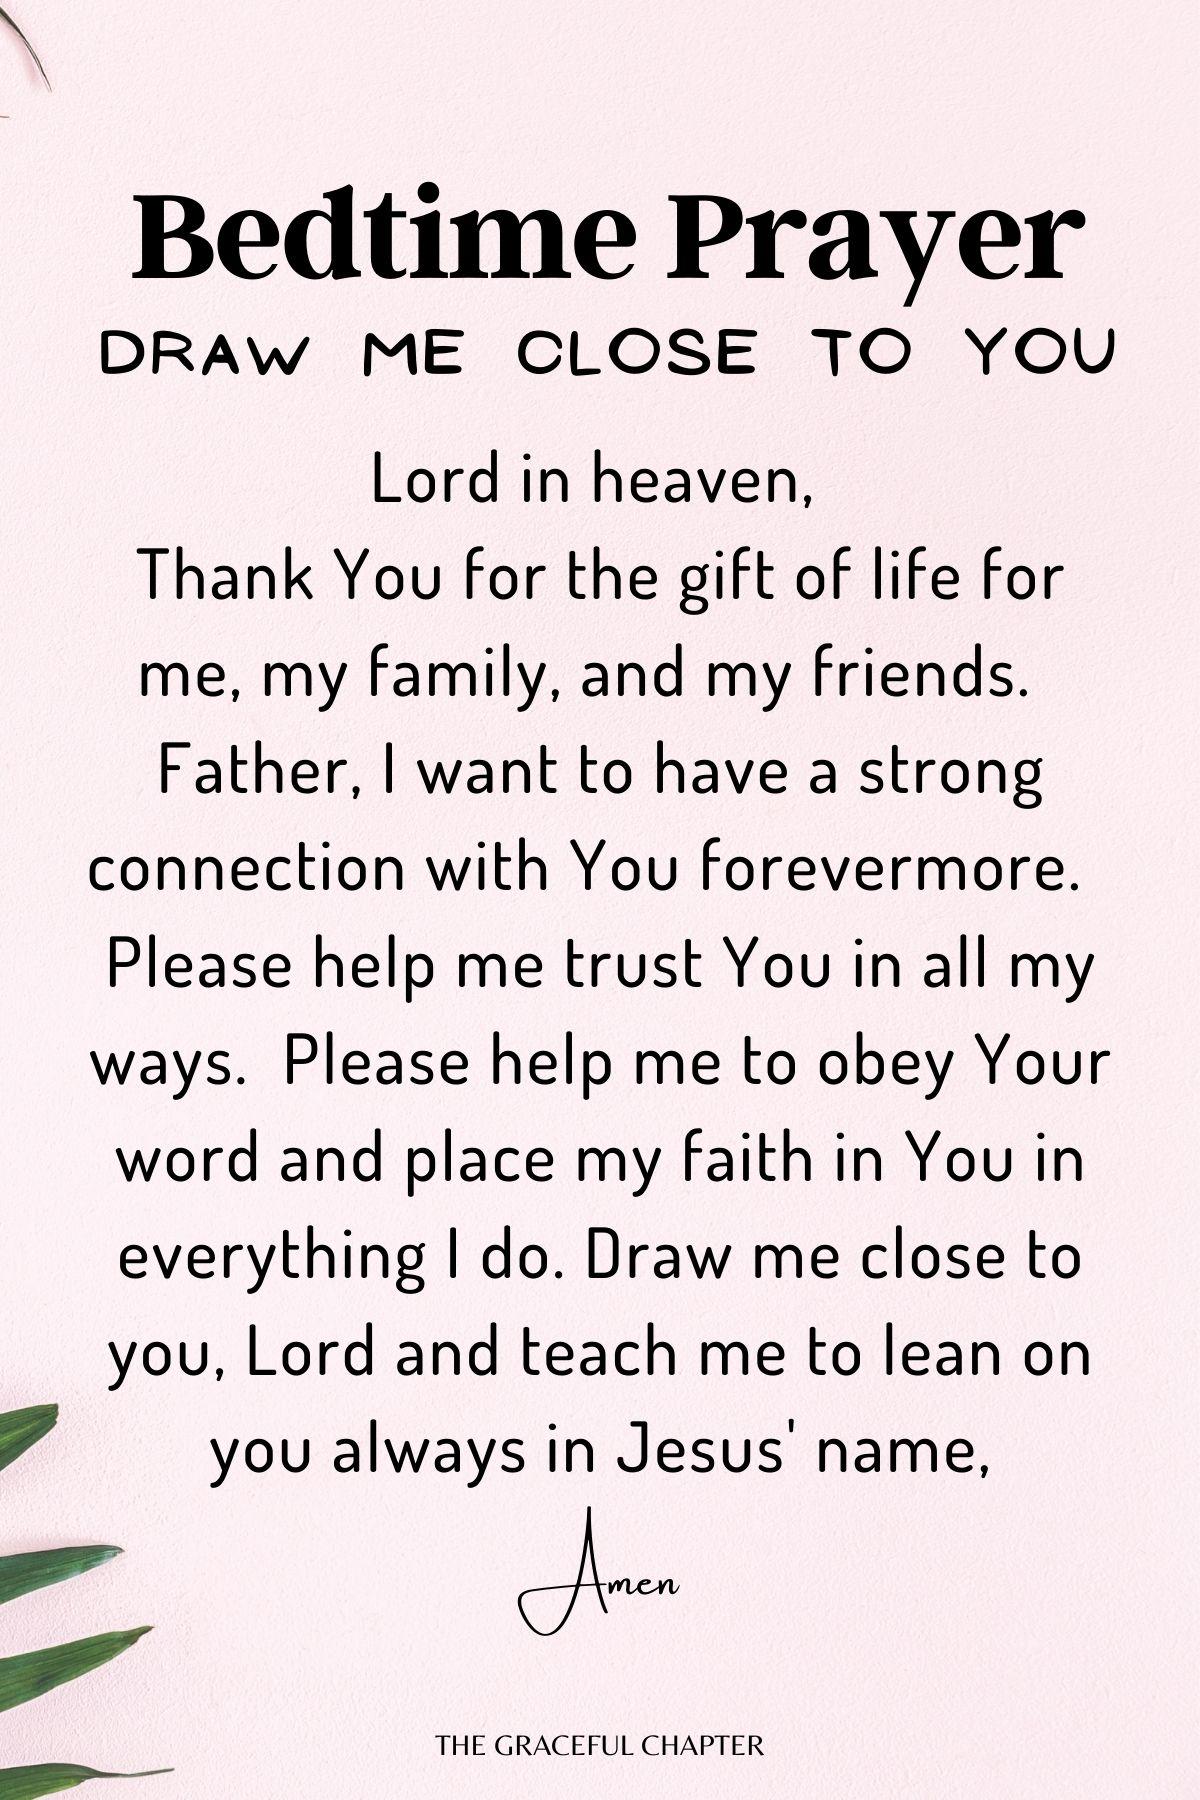 Draw me close to you - short bedtime prayers